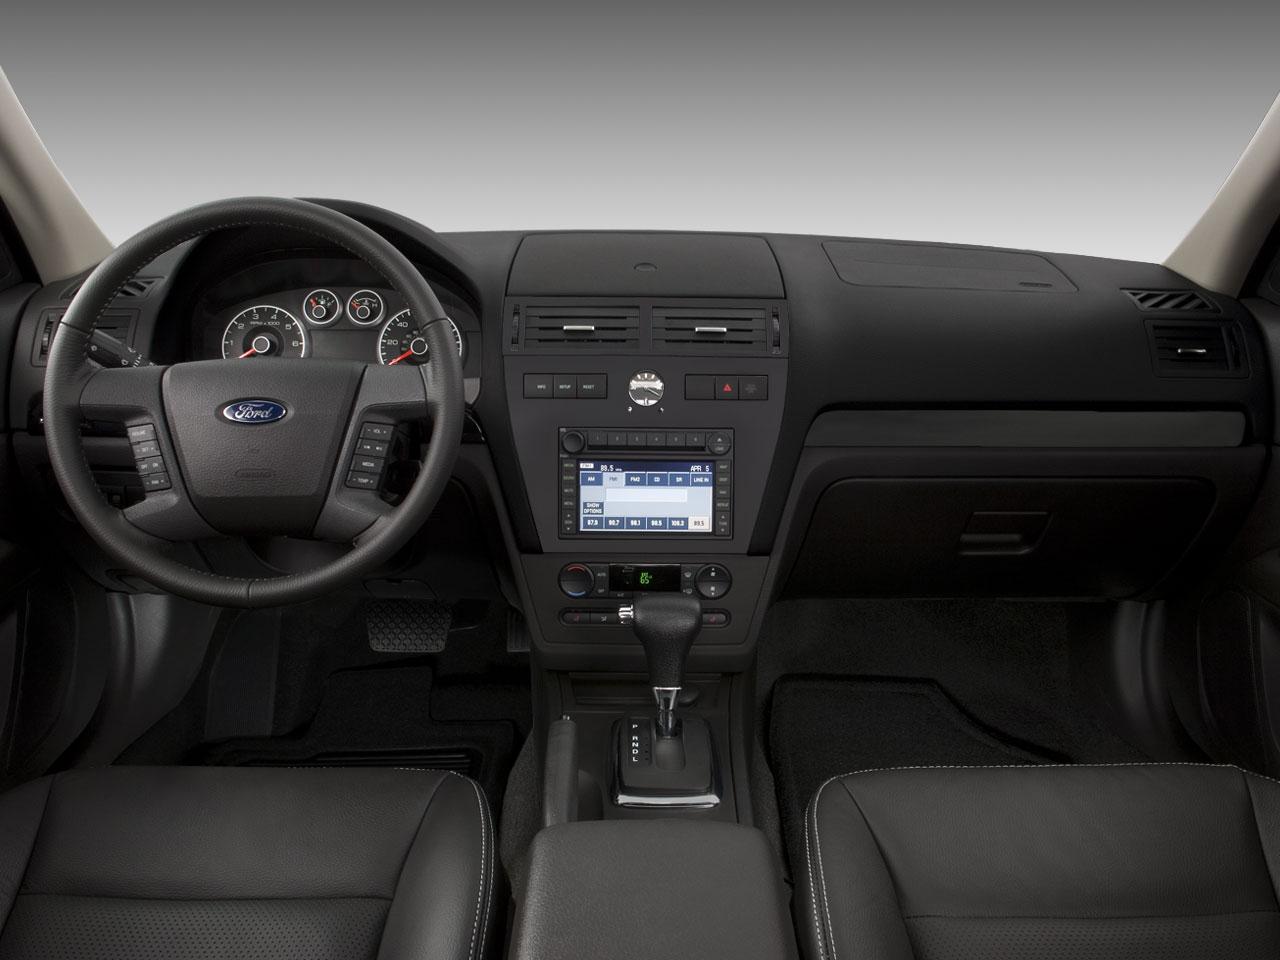 Ford Fusion V6 SEL